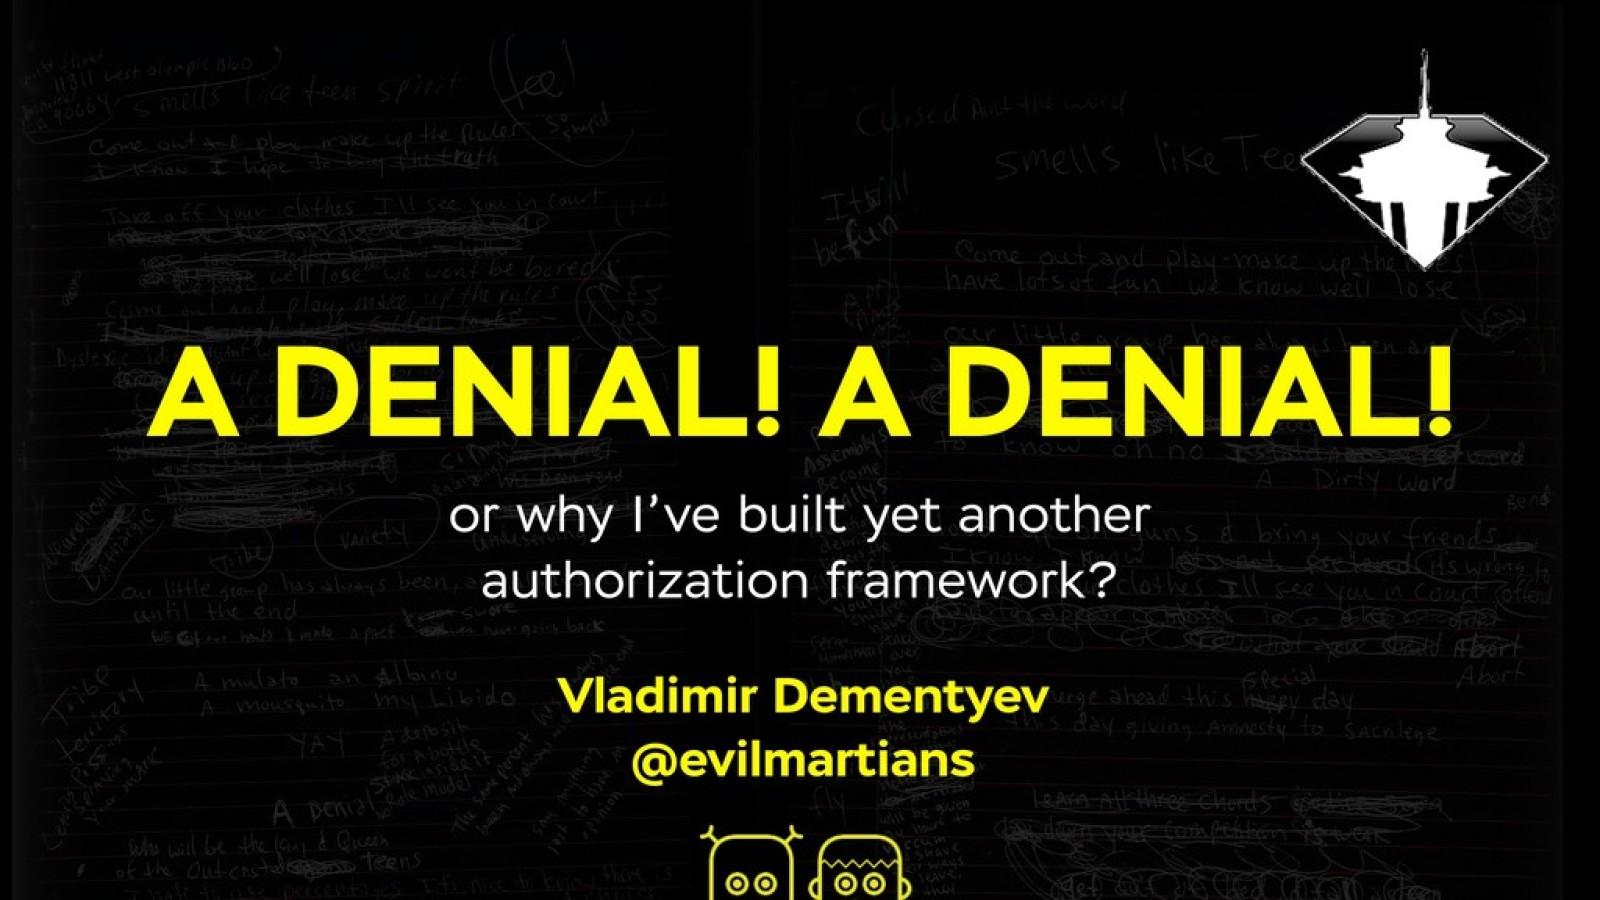 Adenial! Adenial! Adenial!